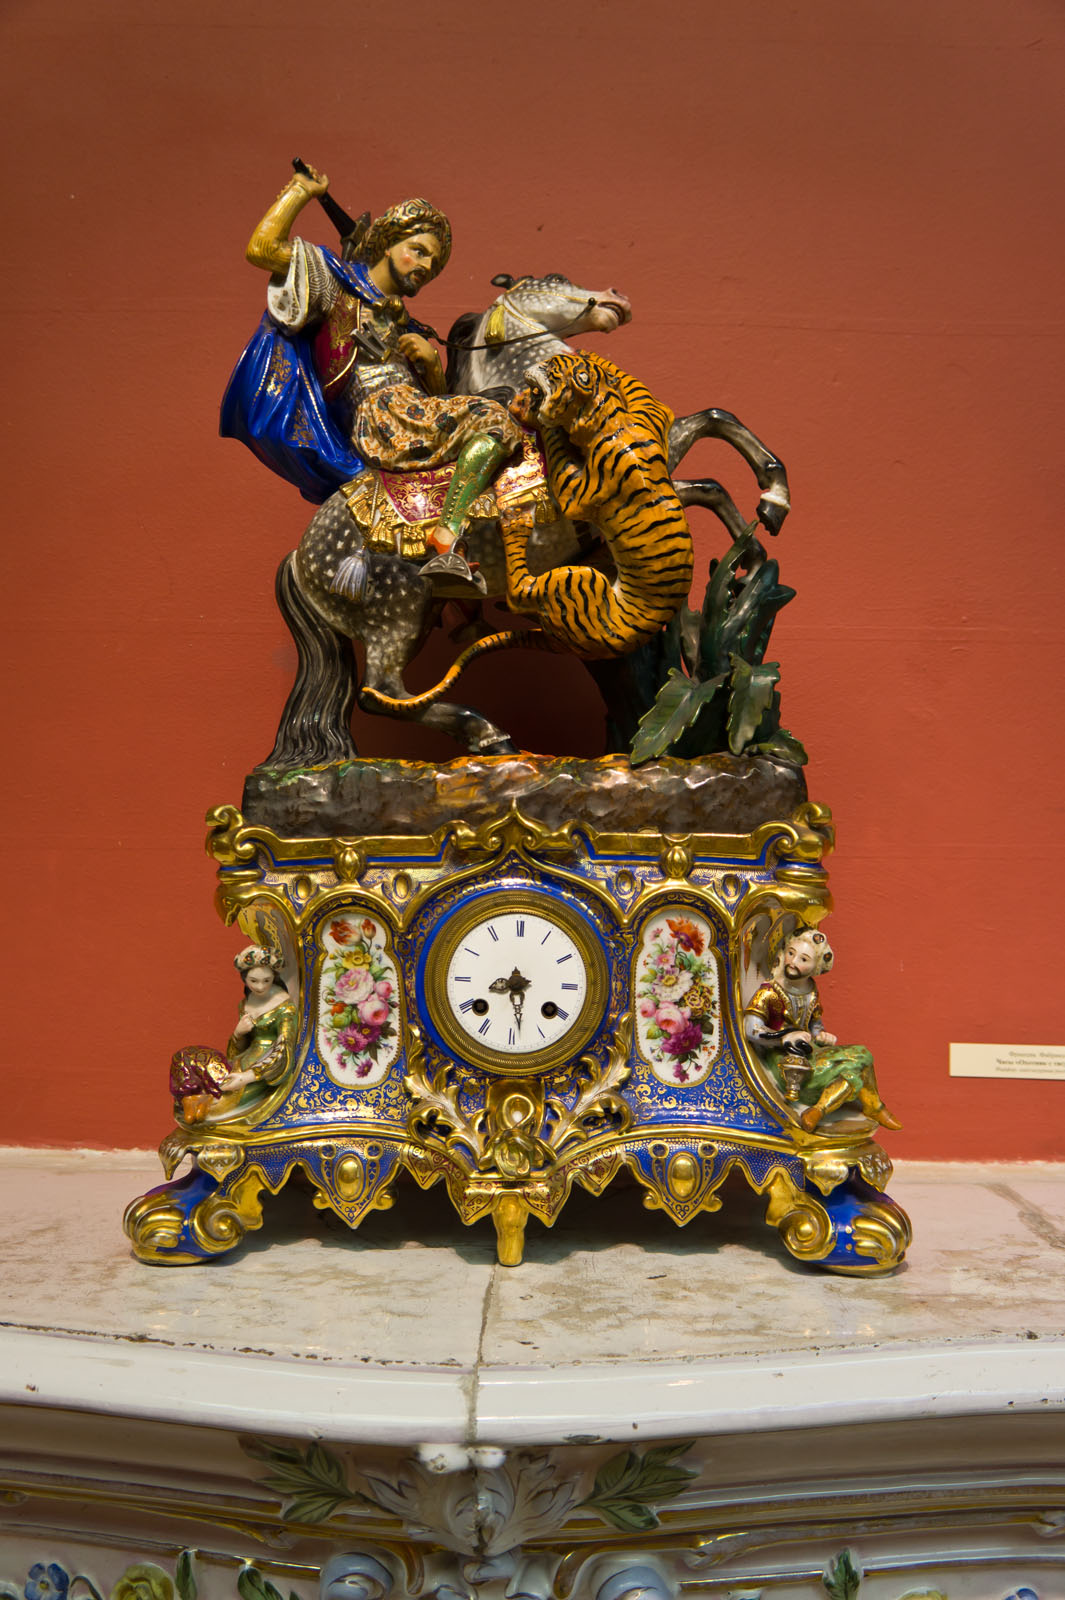 Фото №72551. Часы ''Охотник с тигром'', XIX. Франция, Фабрика Ж.Пети